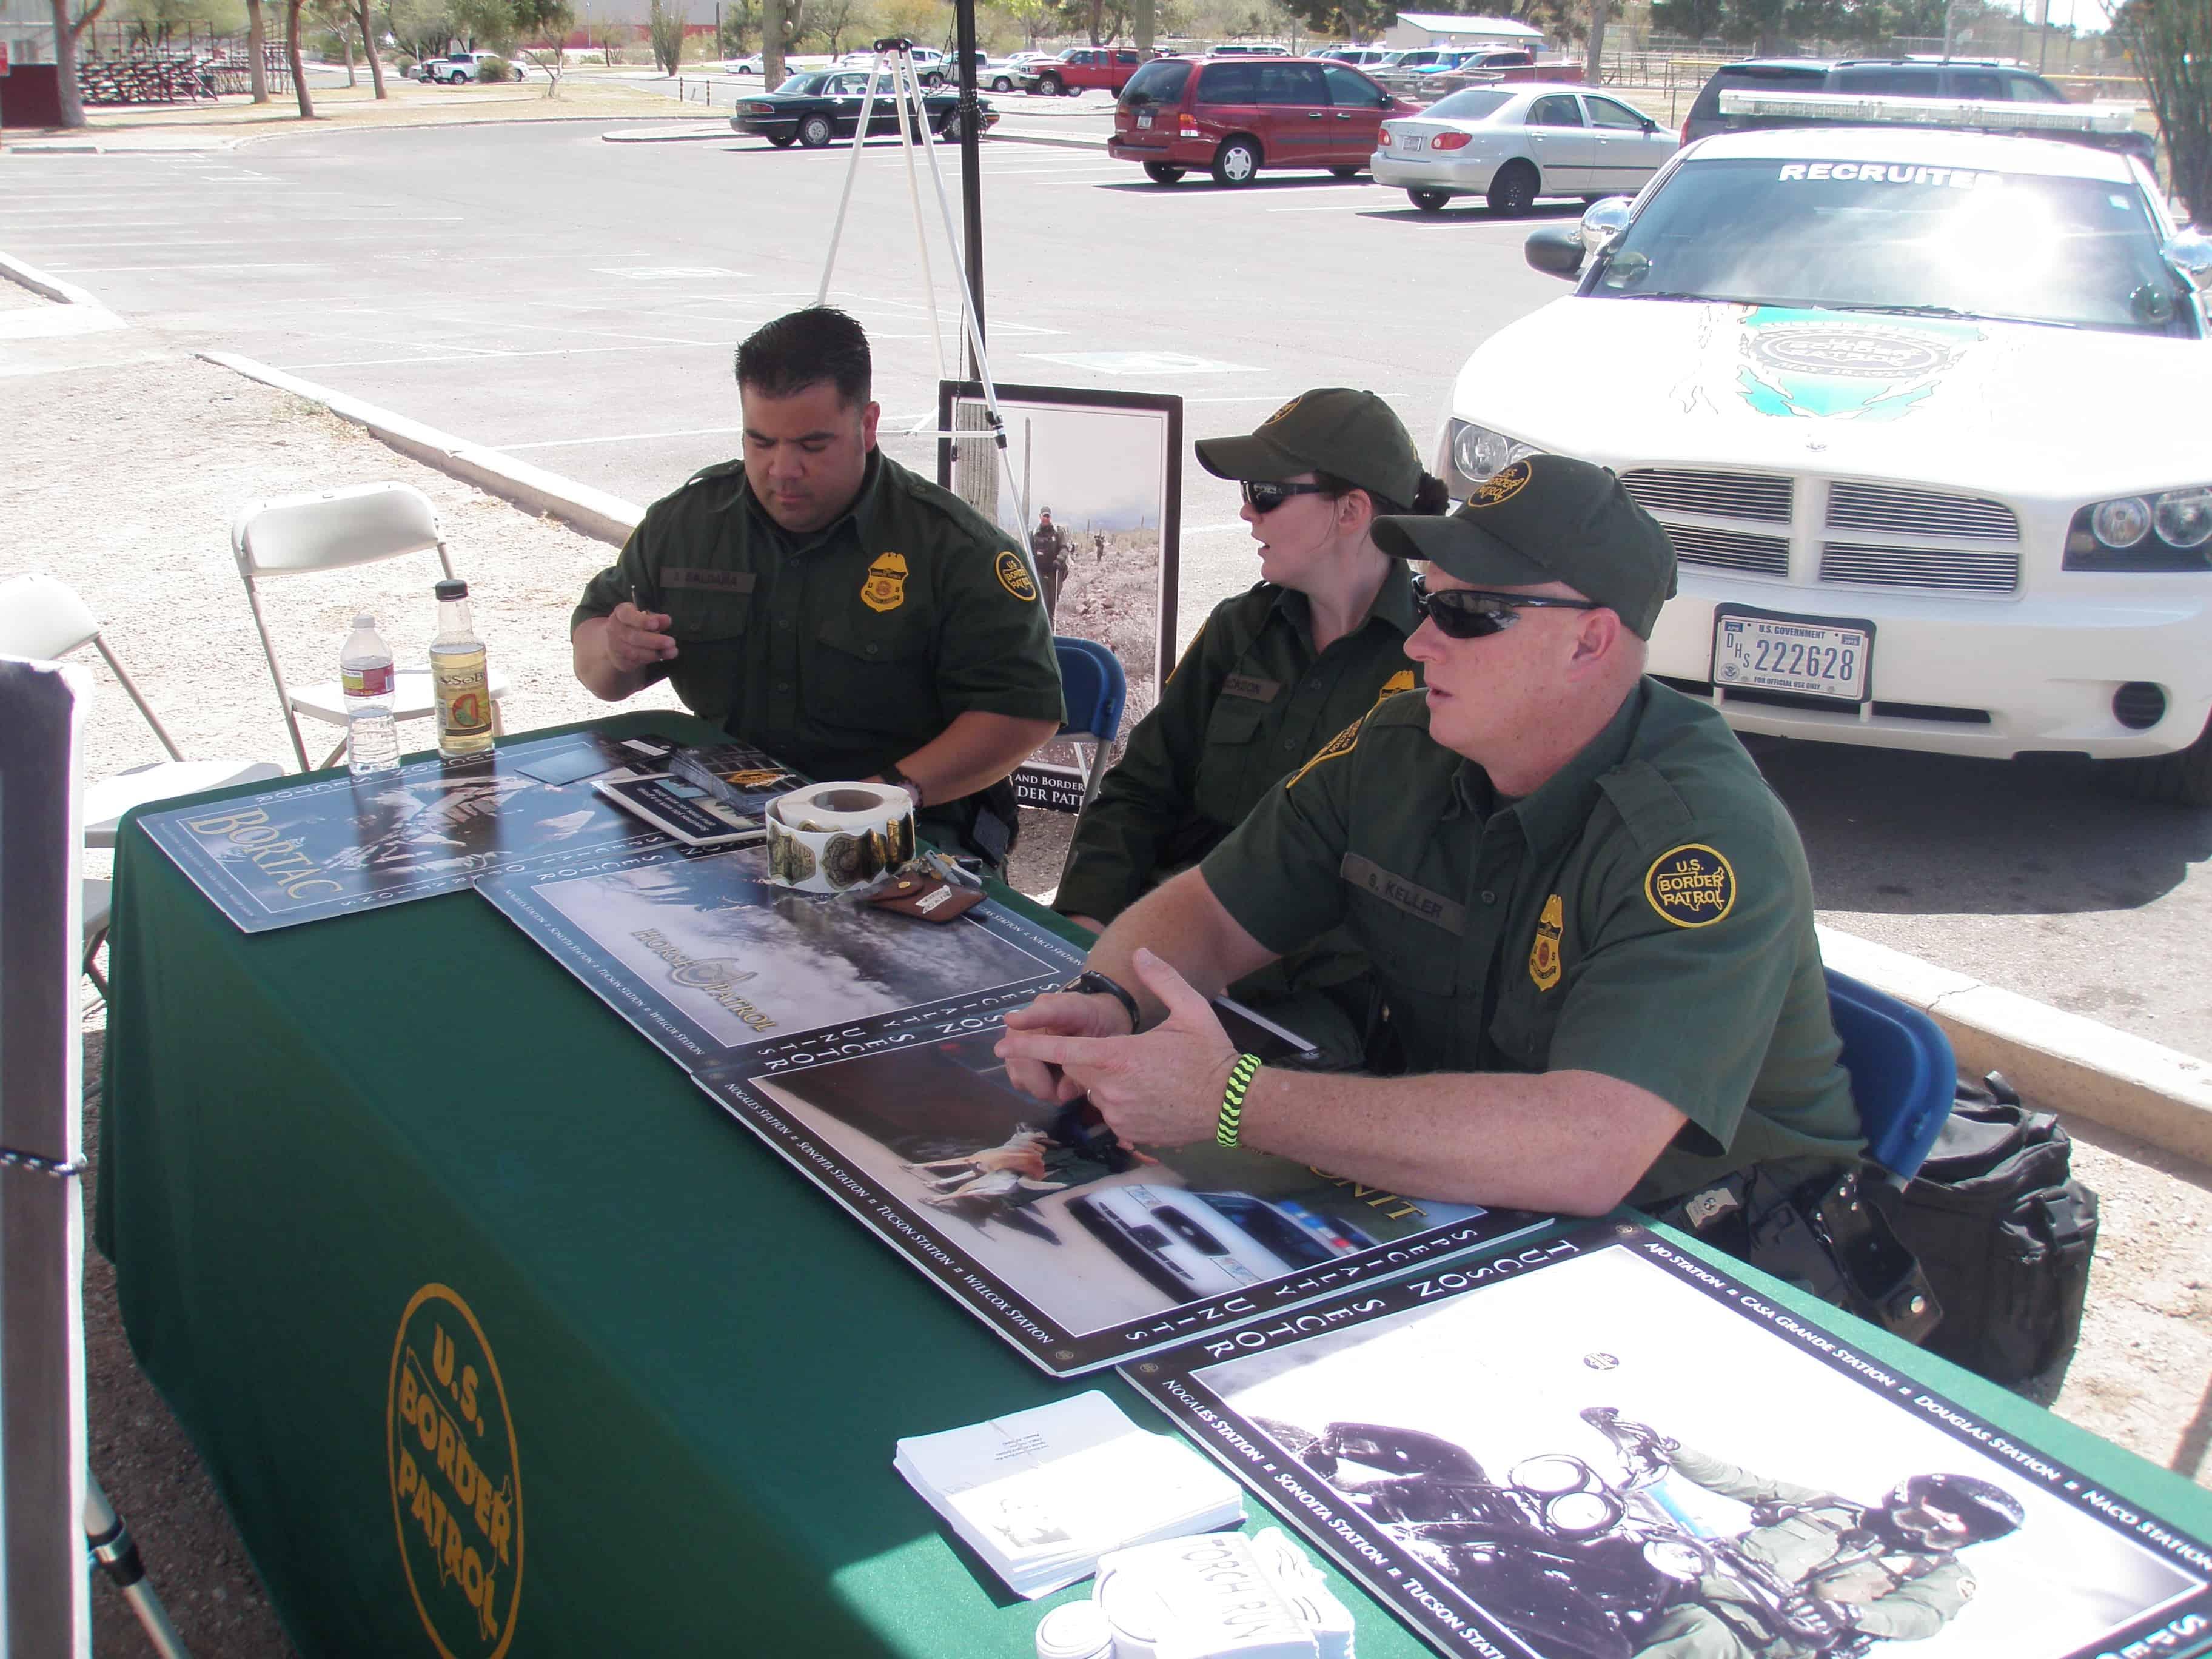 Border Patrol Career Days 2012